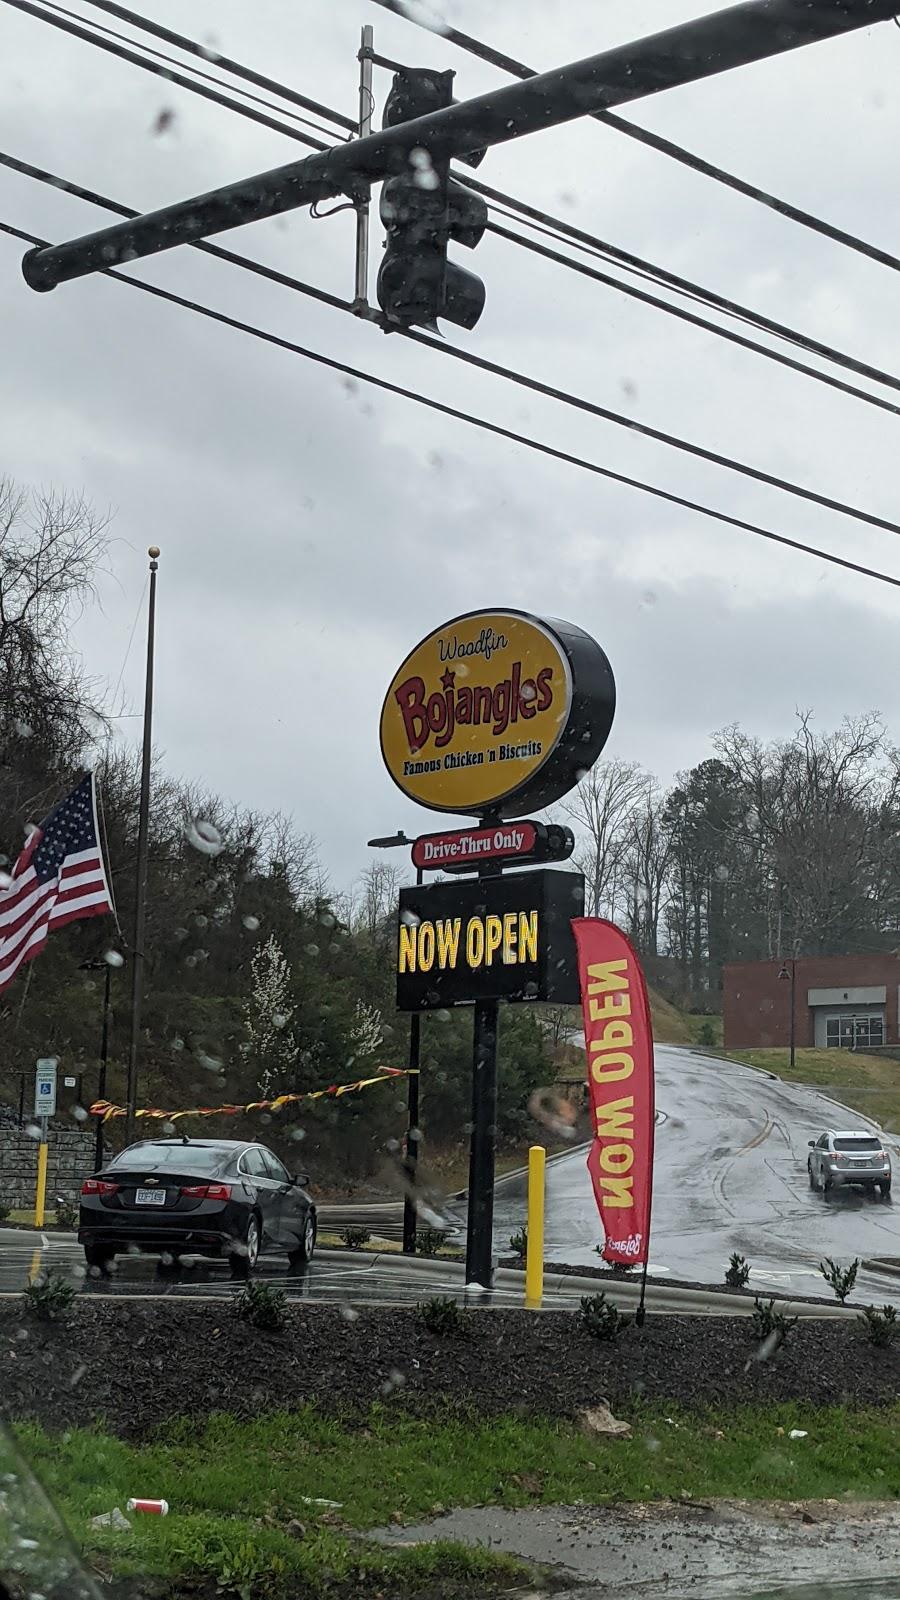 Bojangles   restaurant   127 Weaverville Rd, Woodfin, NC 28804, USA   8284124119 OR +1 828-412-4119